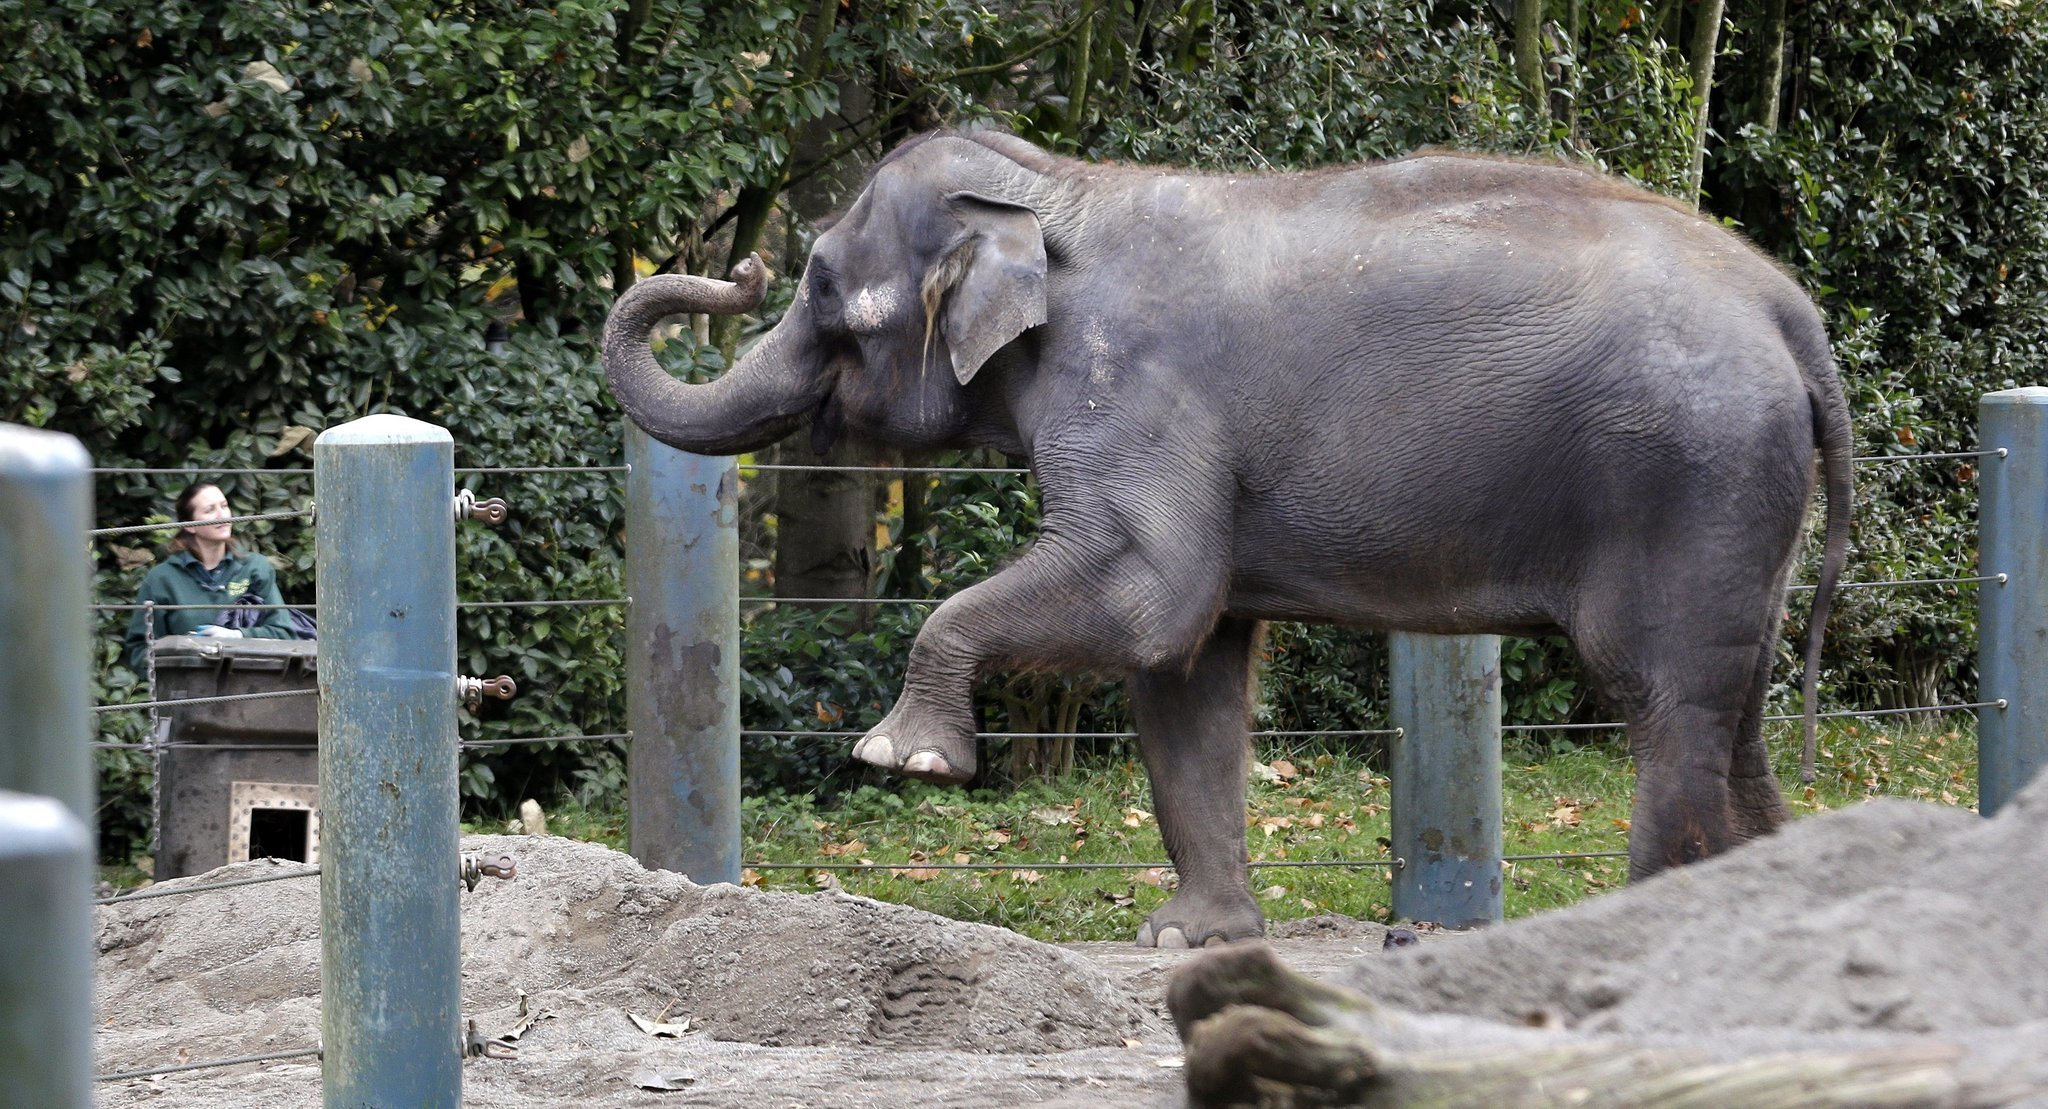 seattle elephants resting  u0026 39 in comfort u0026 39  at san diego zoo